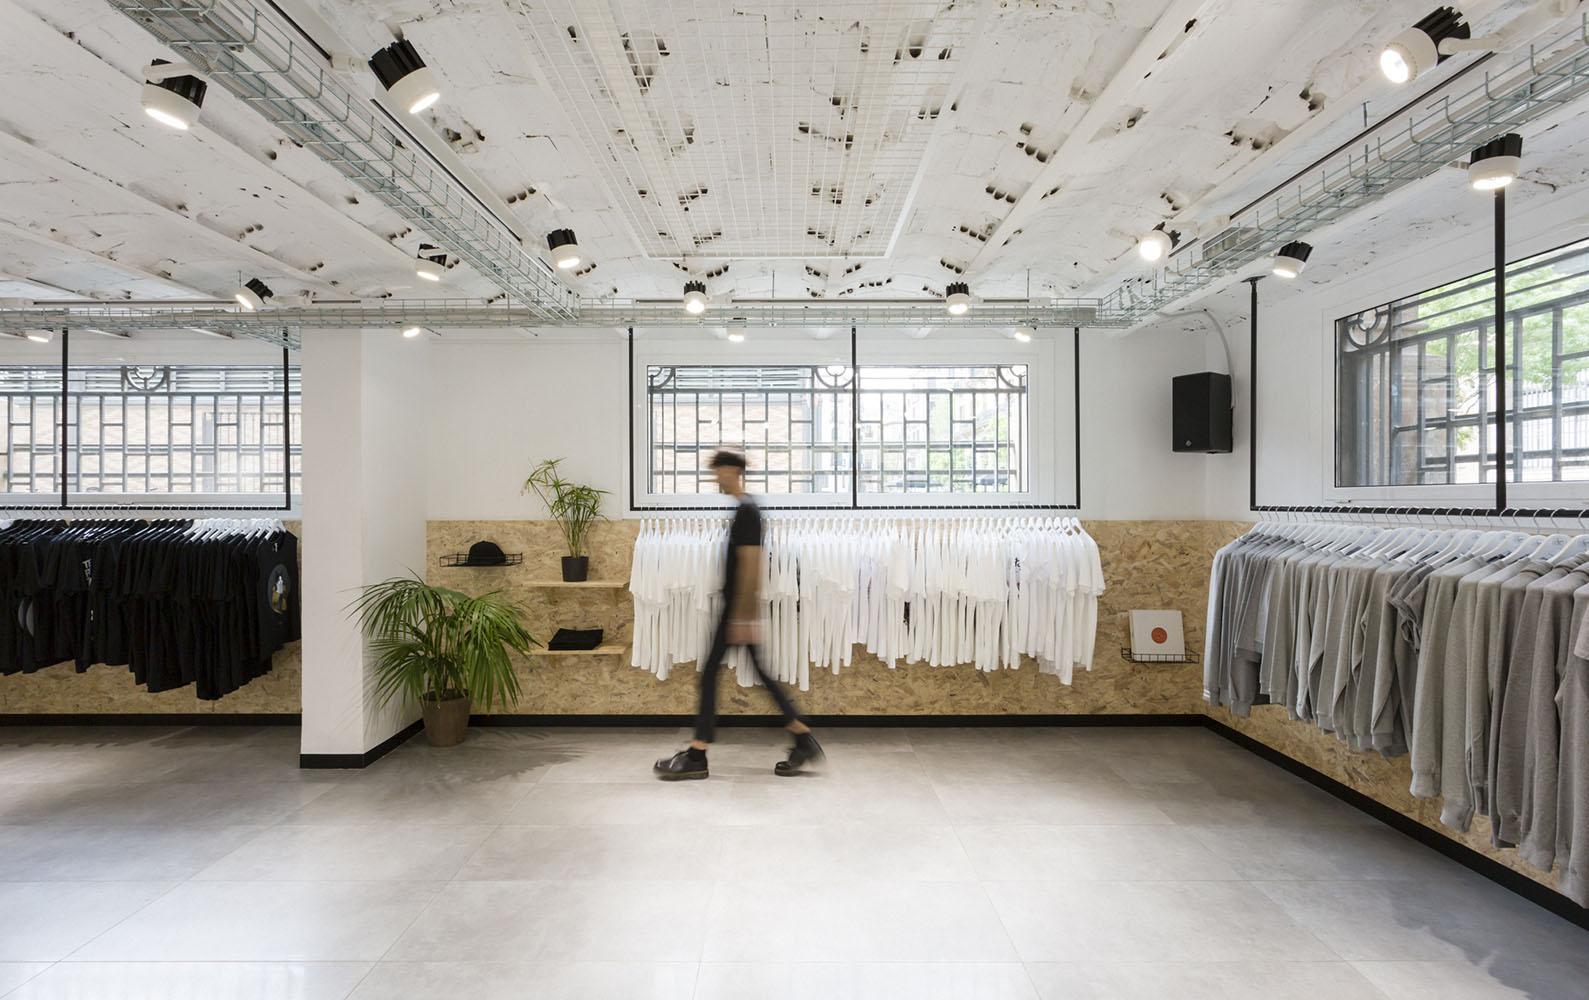 suara music store interior design retail clap estudio creativo suara tienda born barcelona clap. Black Bedroom Furniture Sets. Home Design Ideas